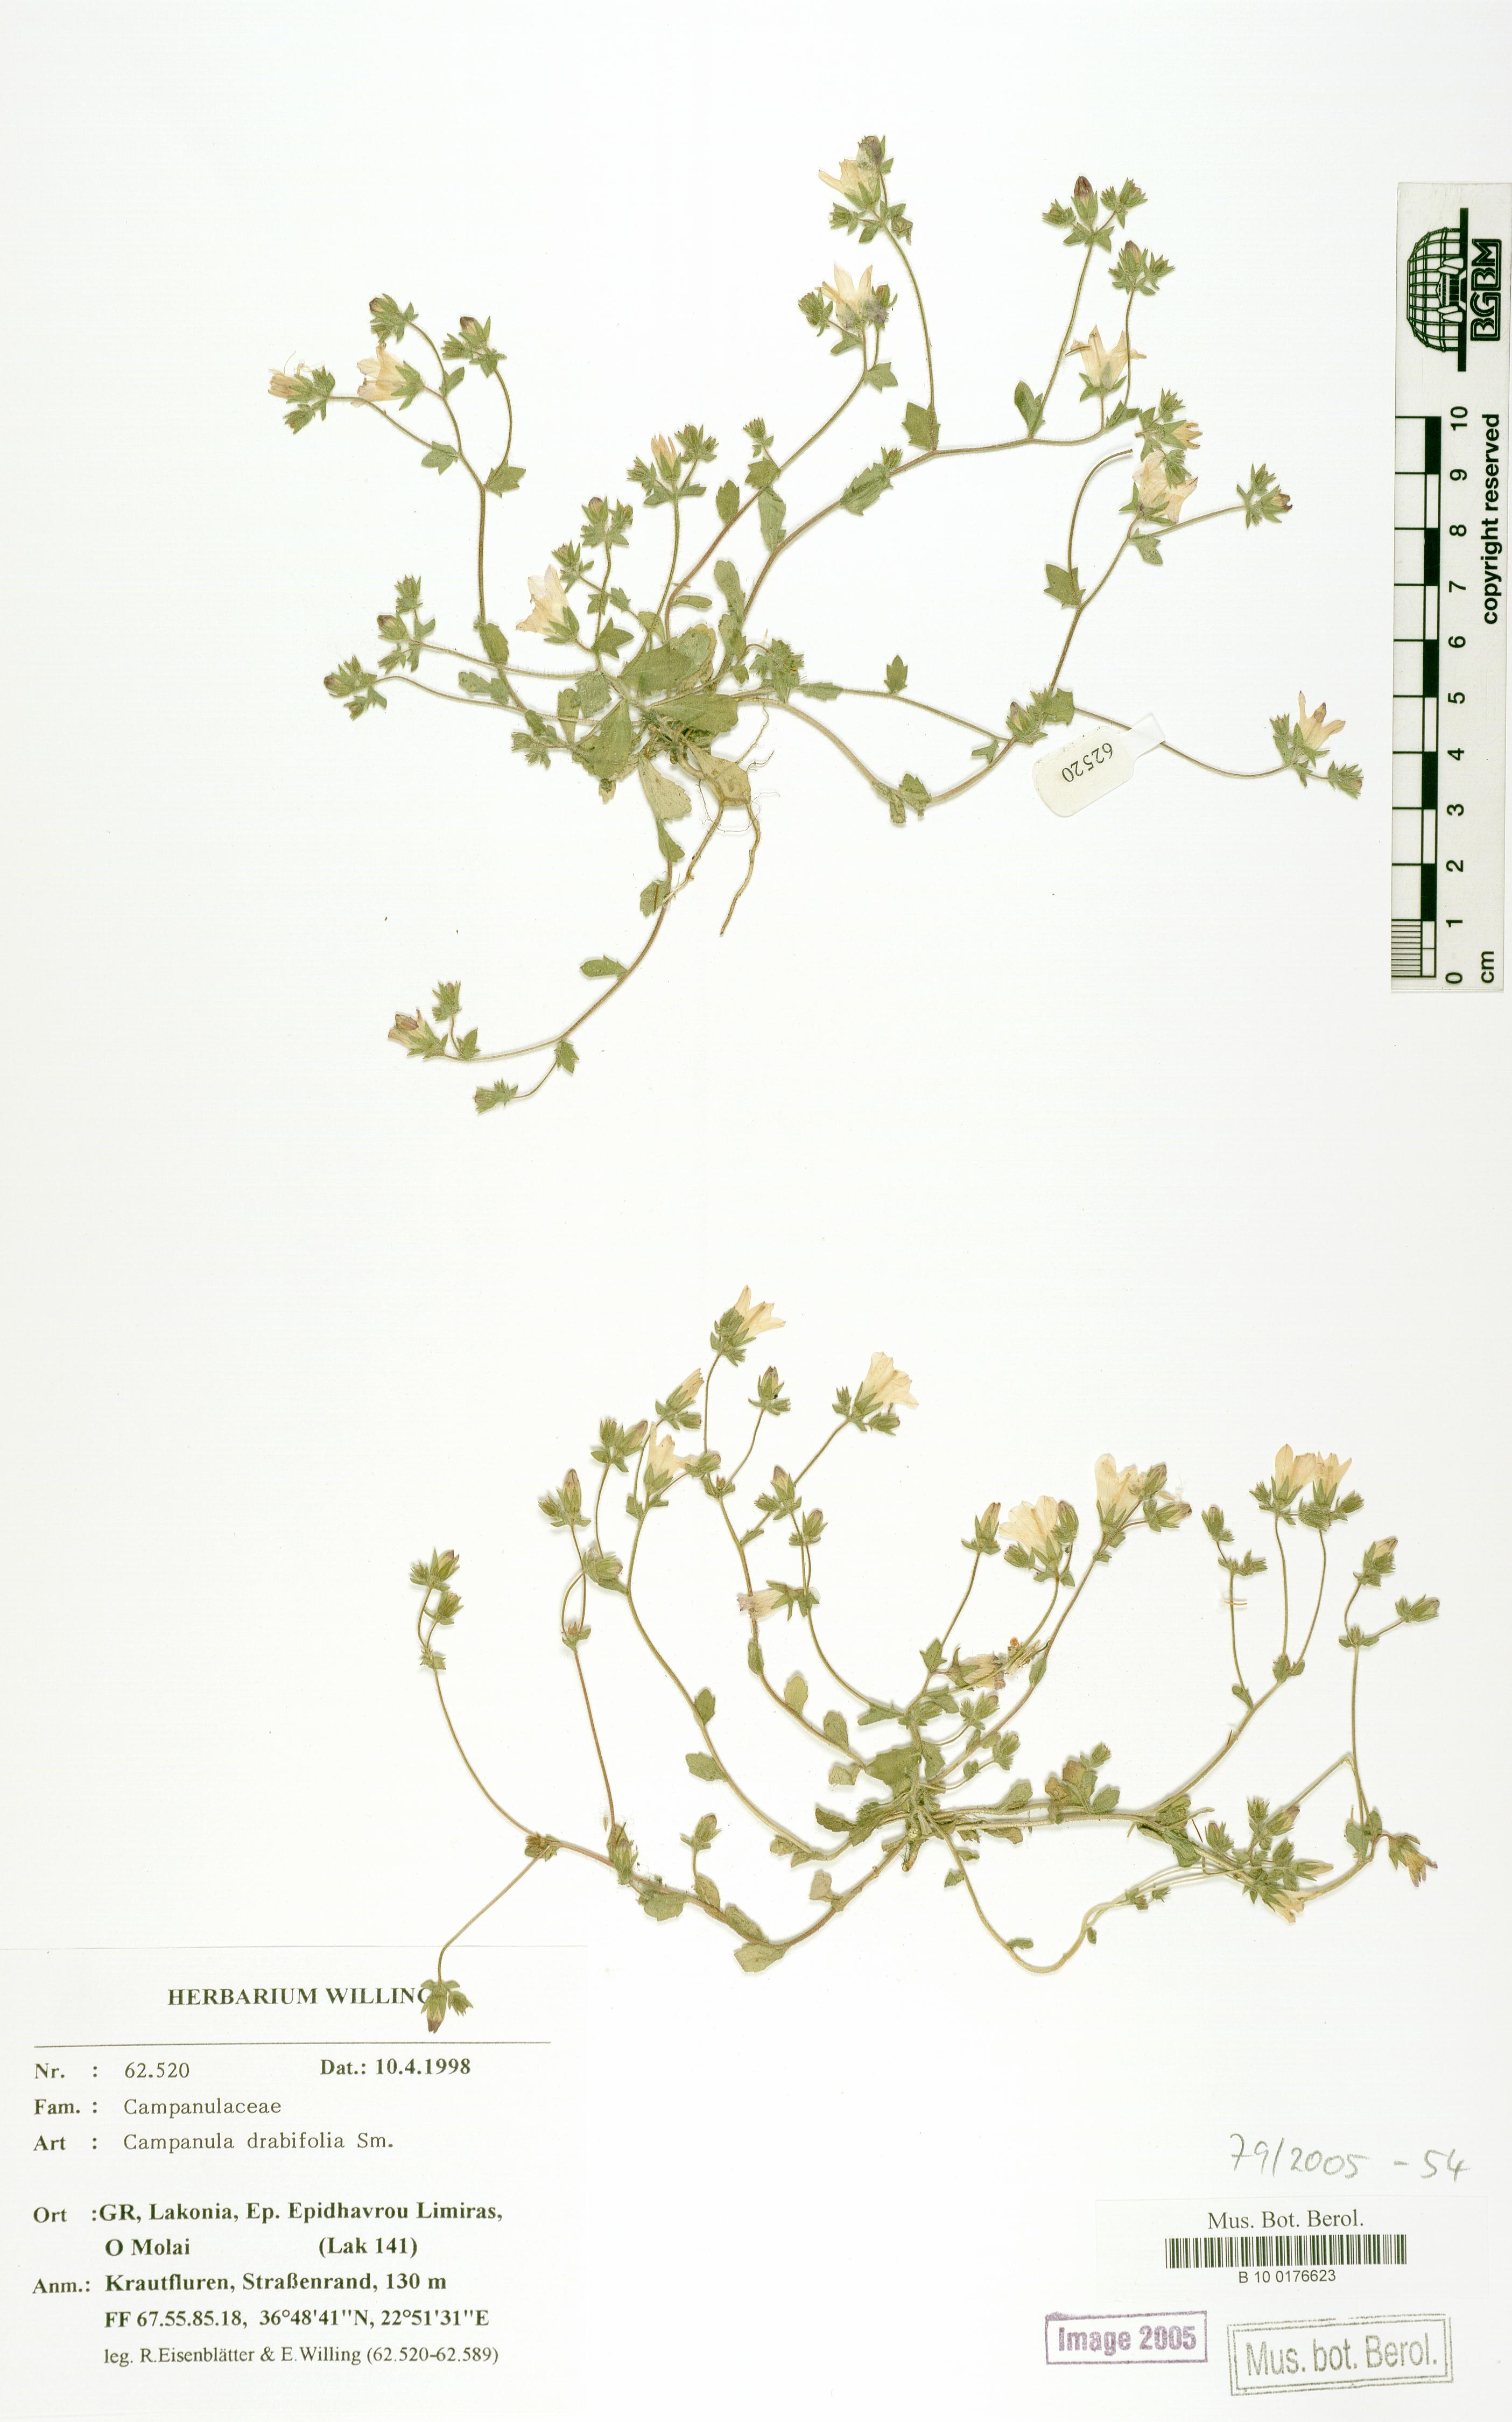 http://ww2.bgbm.org/herbarium/images/B/10/01/76/62/B_10_0176623.jpg